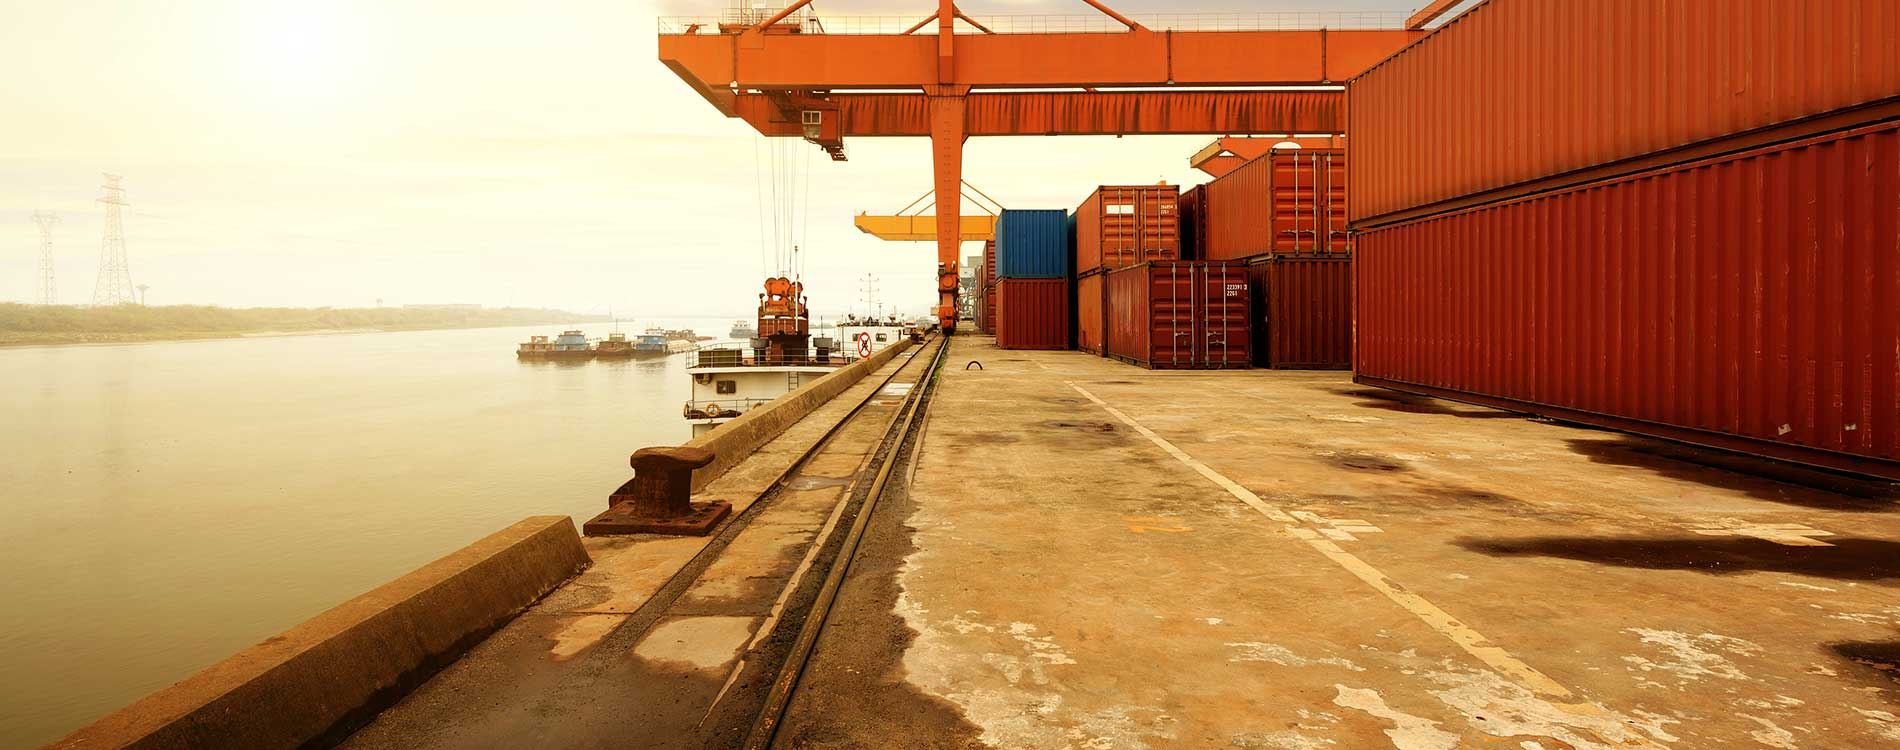 marine cargo yard